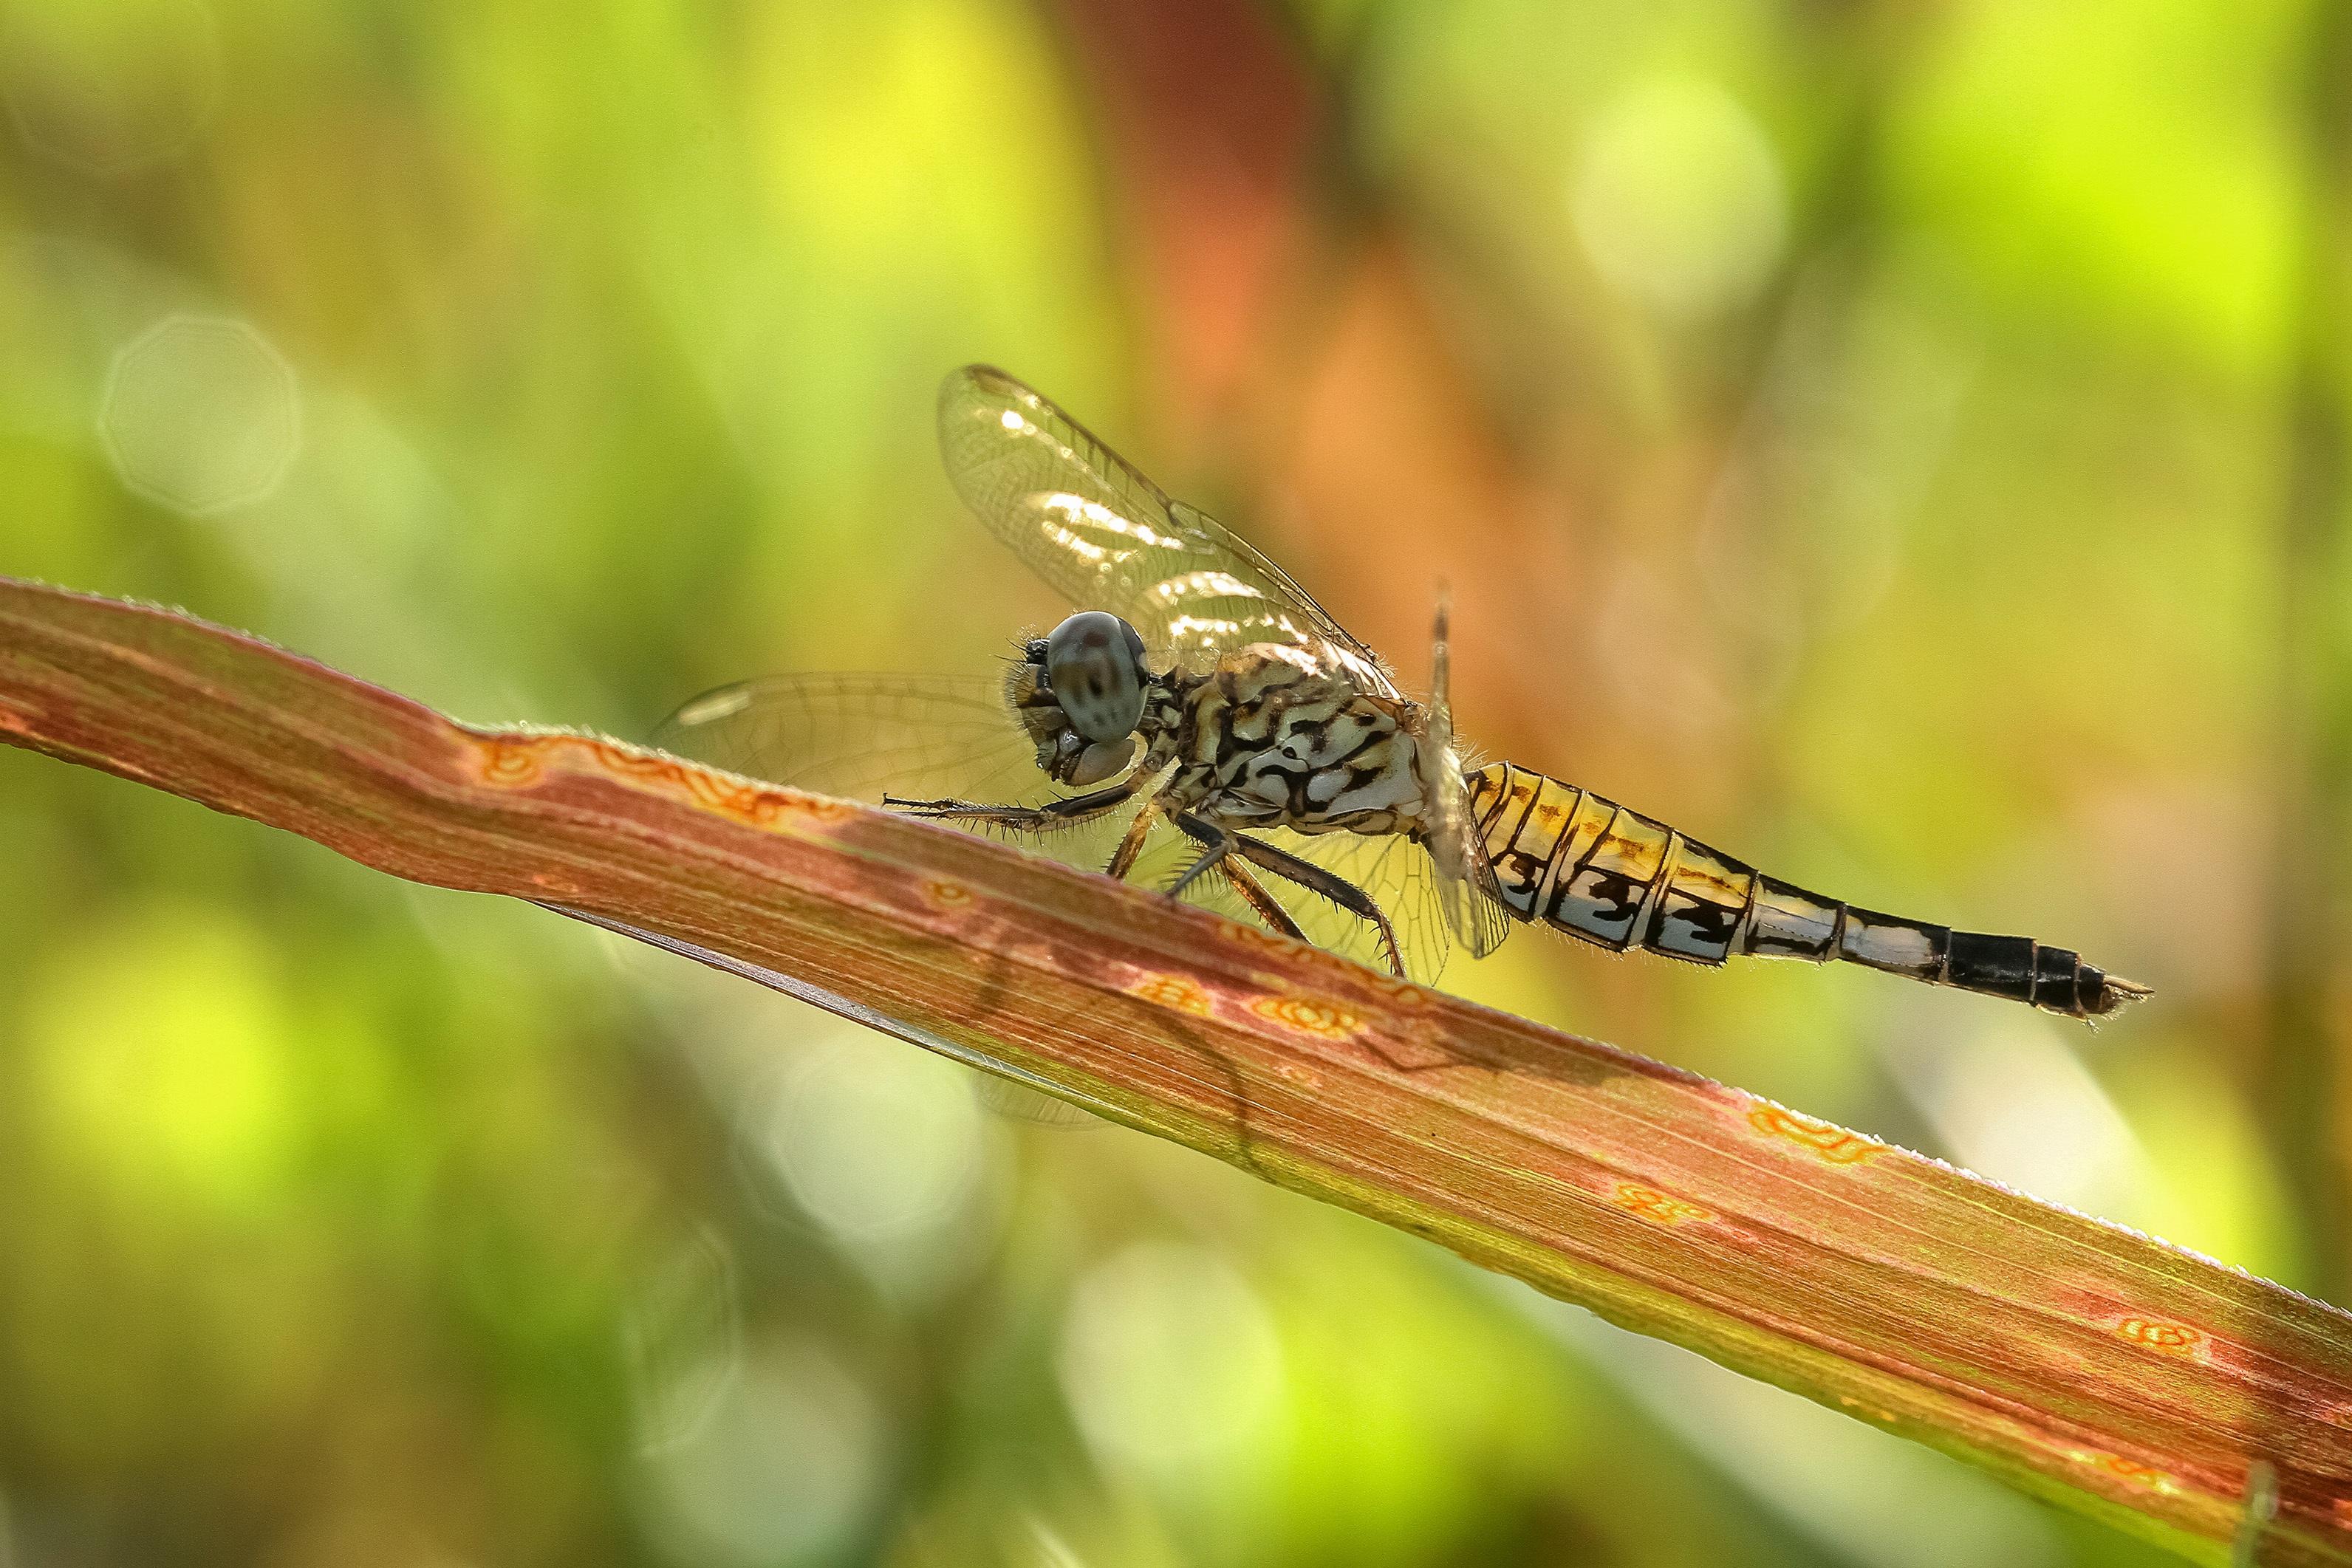 Dagonfly photo